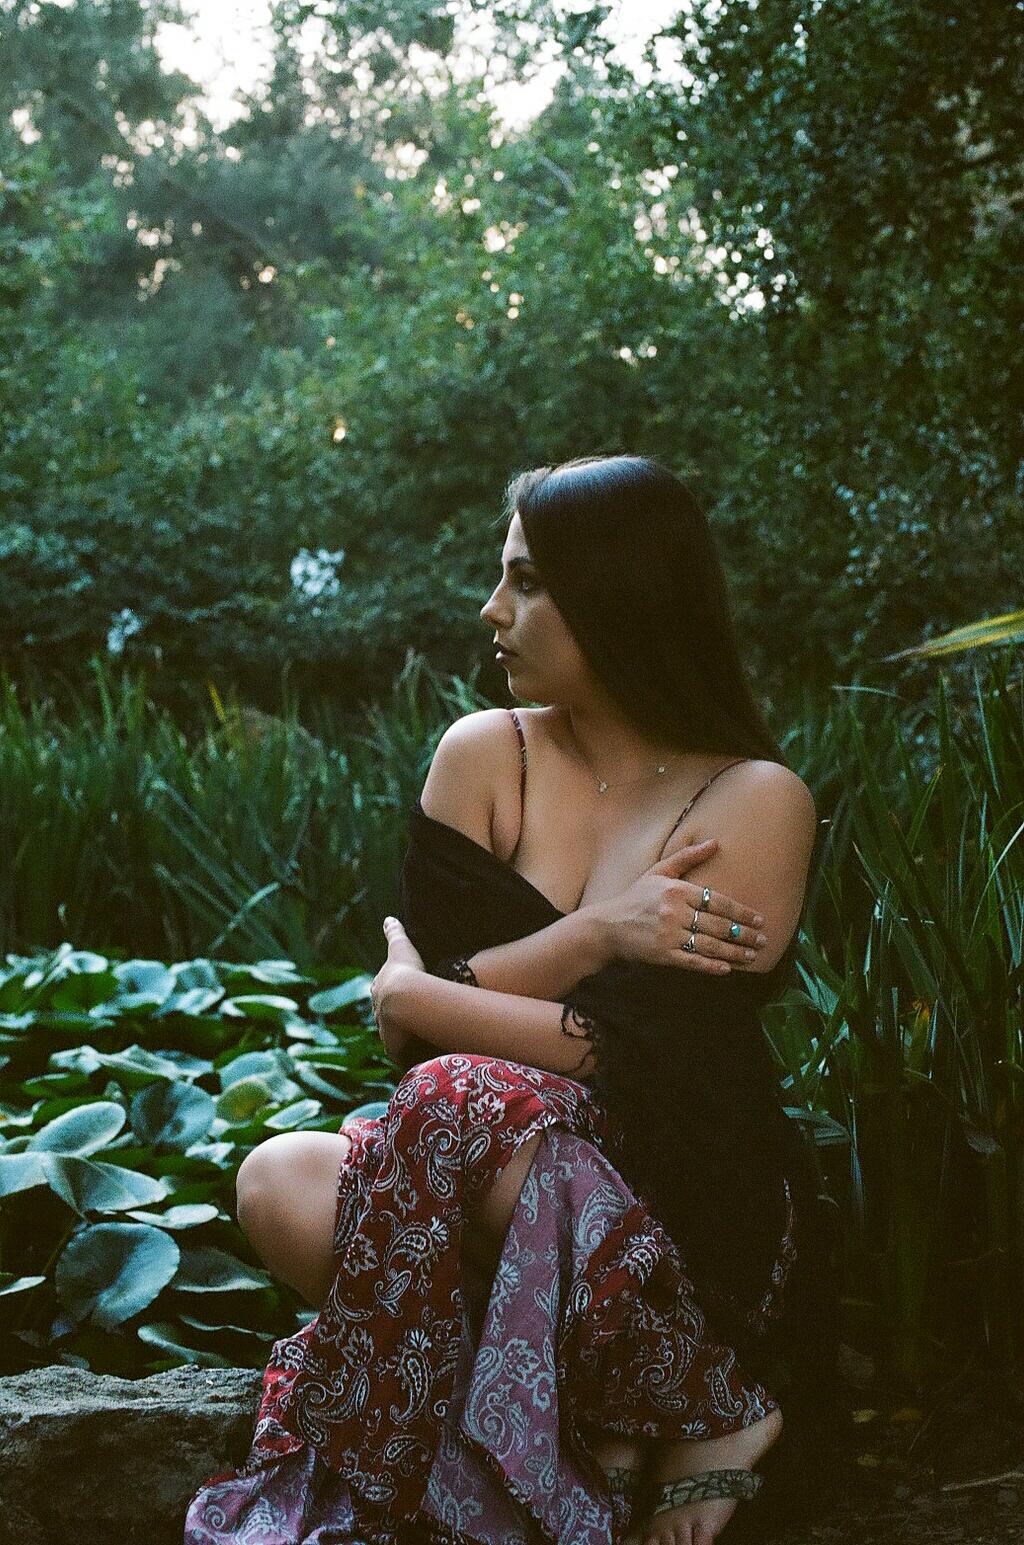 Sierra Marceline